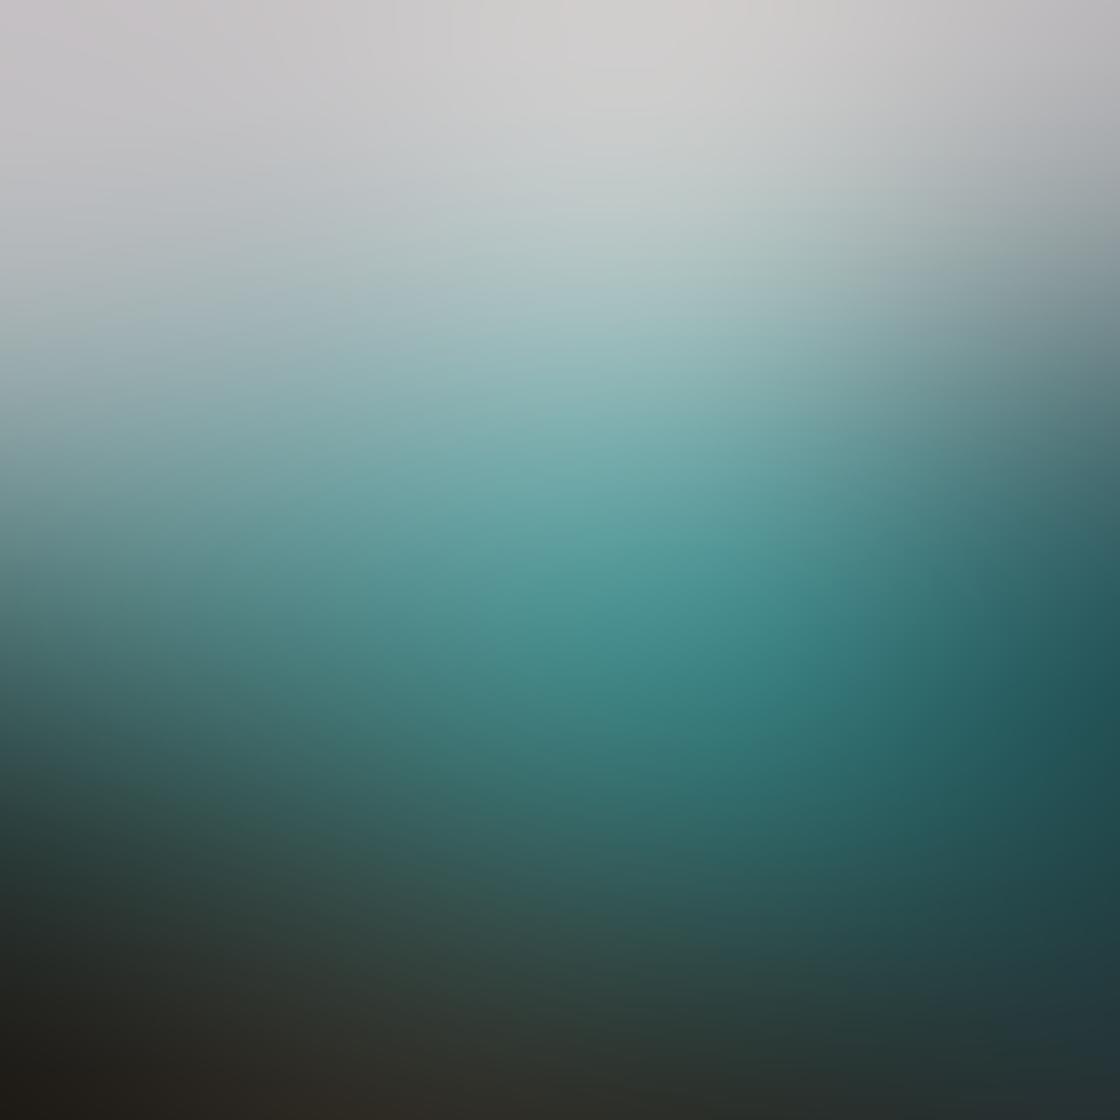 Sheldon Serkin iPhone Photos 19